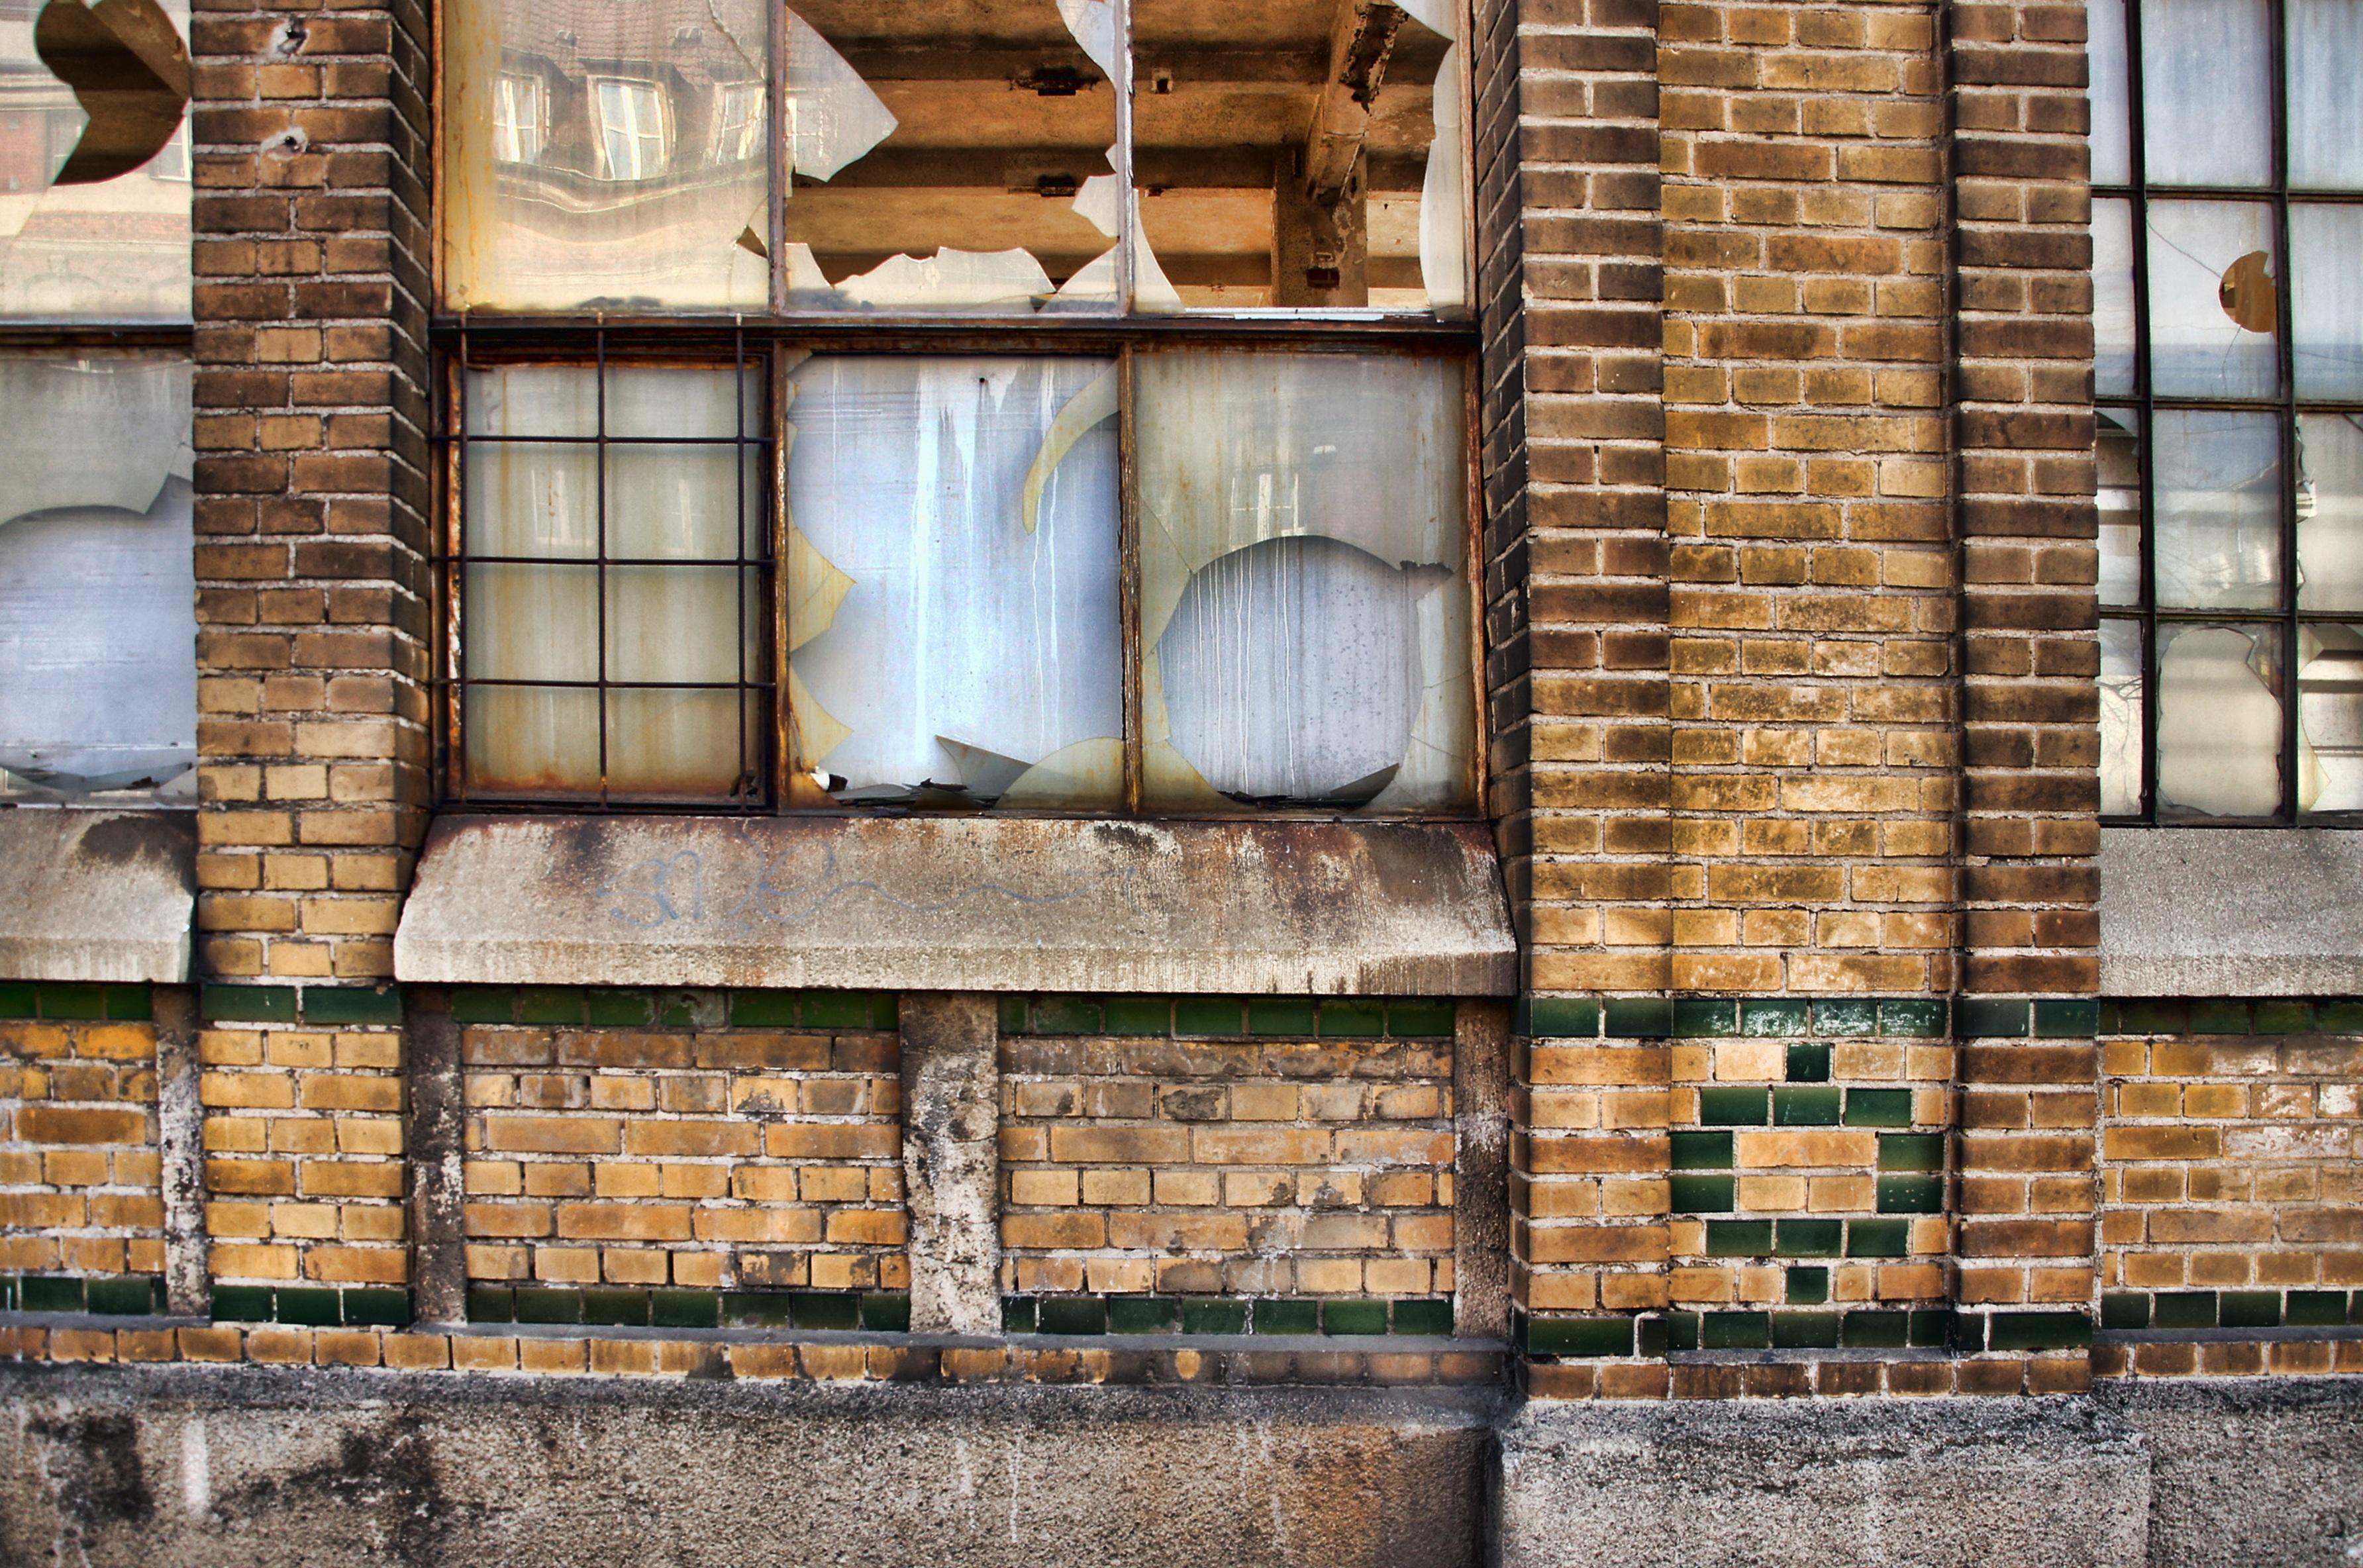 arquitectura madera casa ventana casa pared piedra fachada decaer edificio viejo ladrillo material diseño de interiores